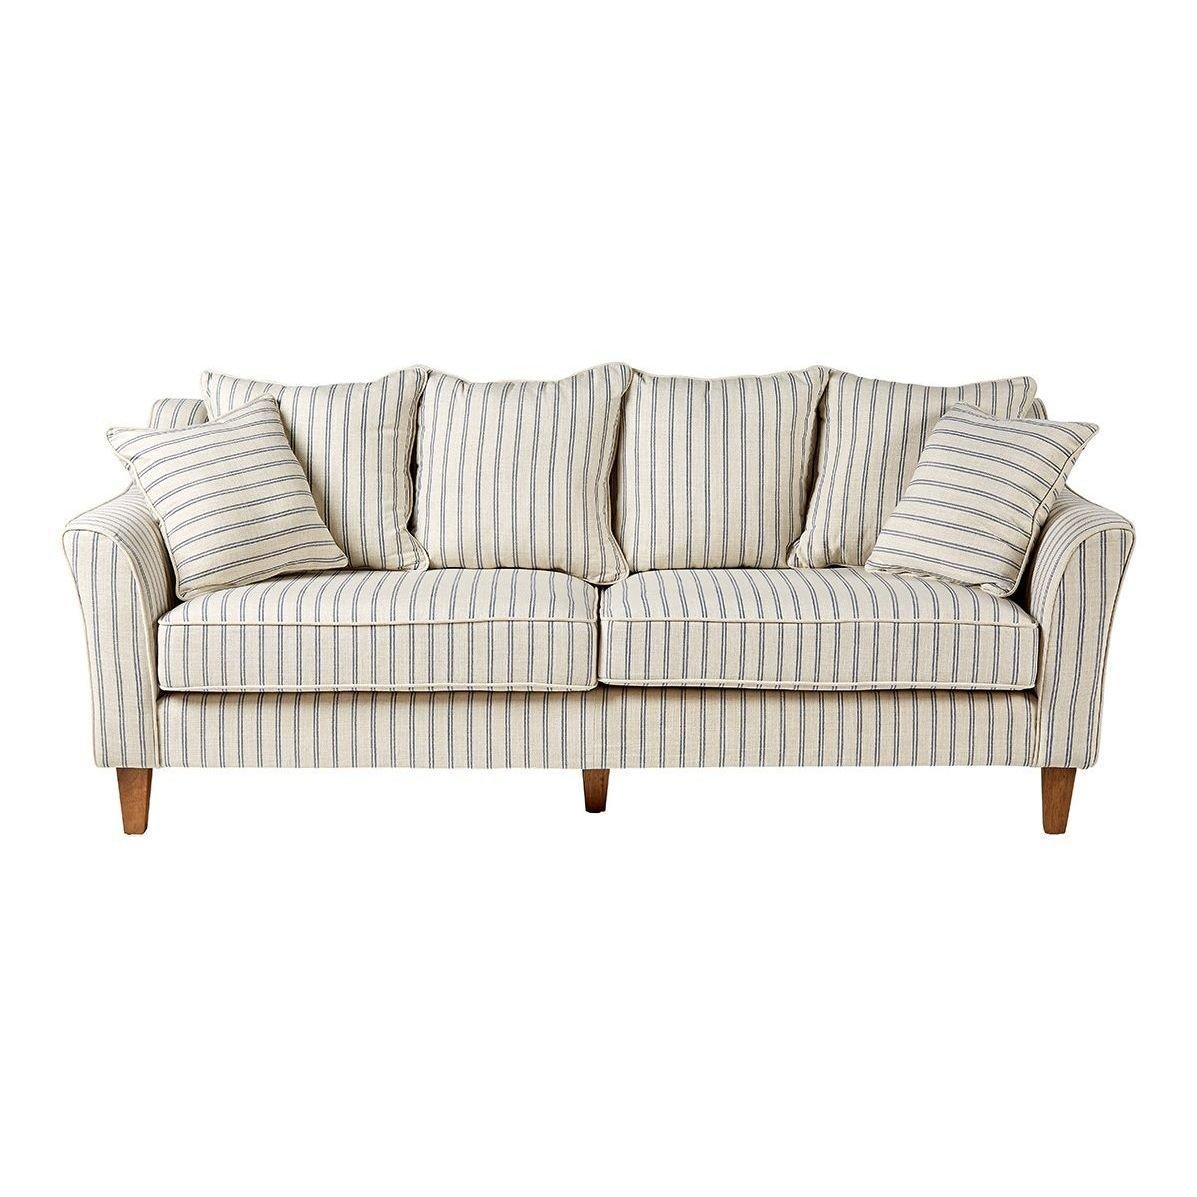 sofa en ingles target sleeper sofás 2 plazas el corte inglés